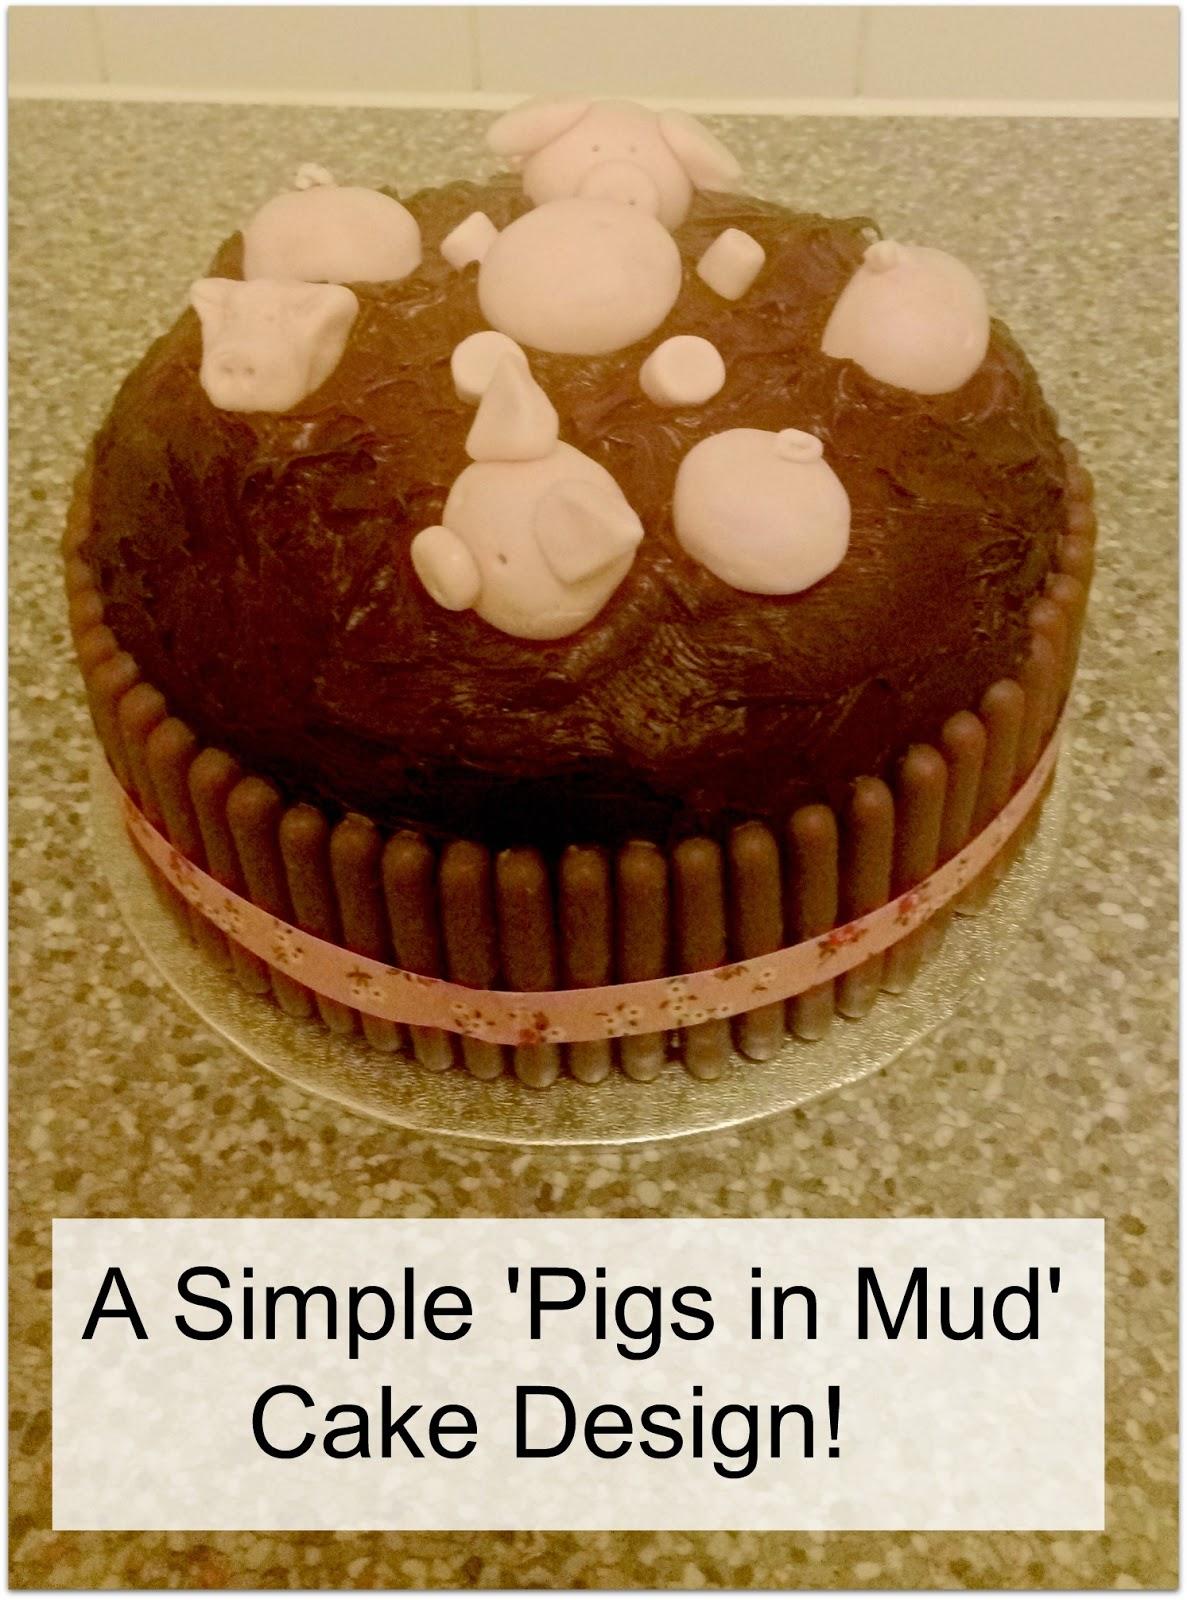 Cake Decorating Mud Cake Recipe : Easy Cake to Decorate: Pigs in Mud The Parent Game